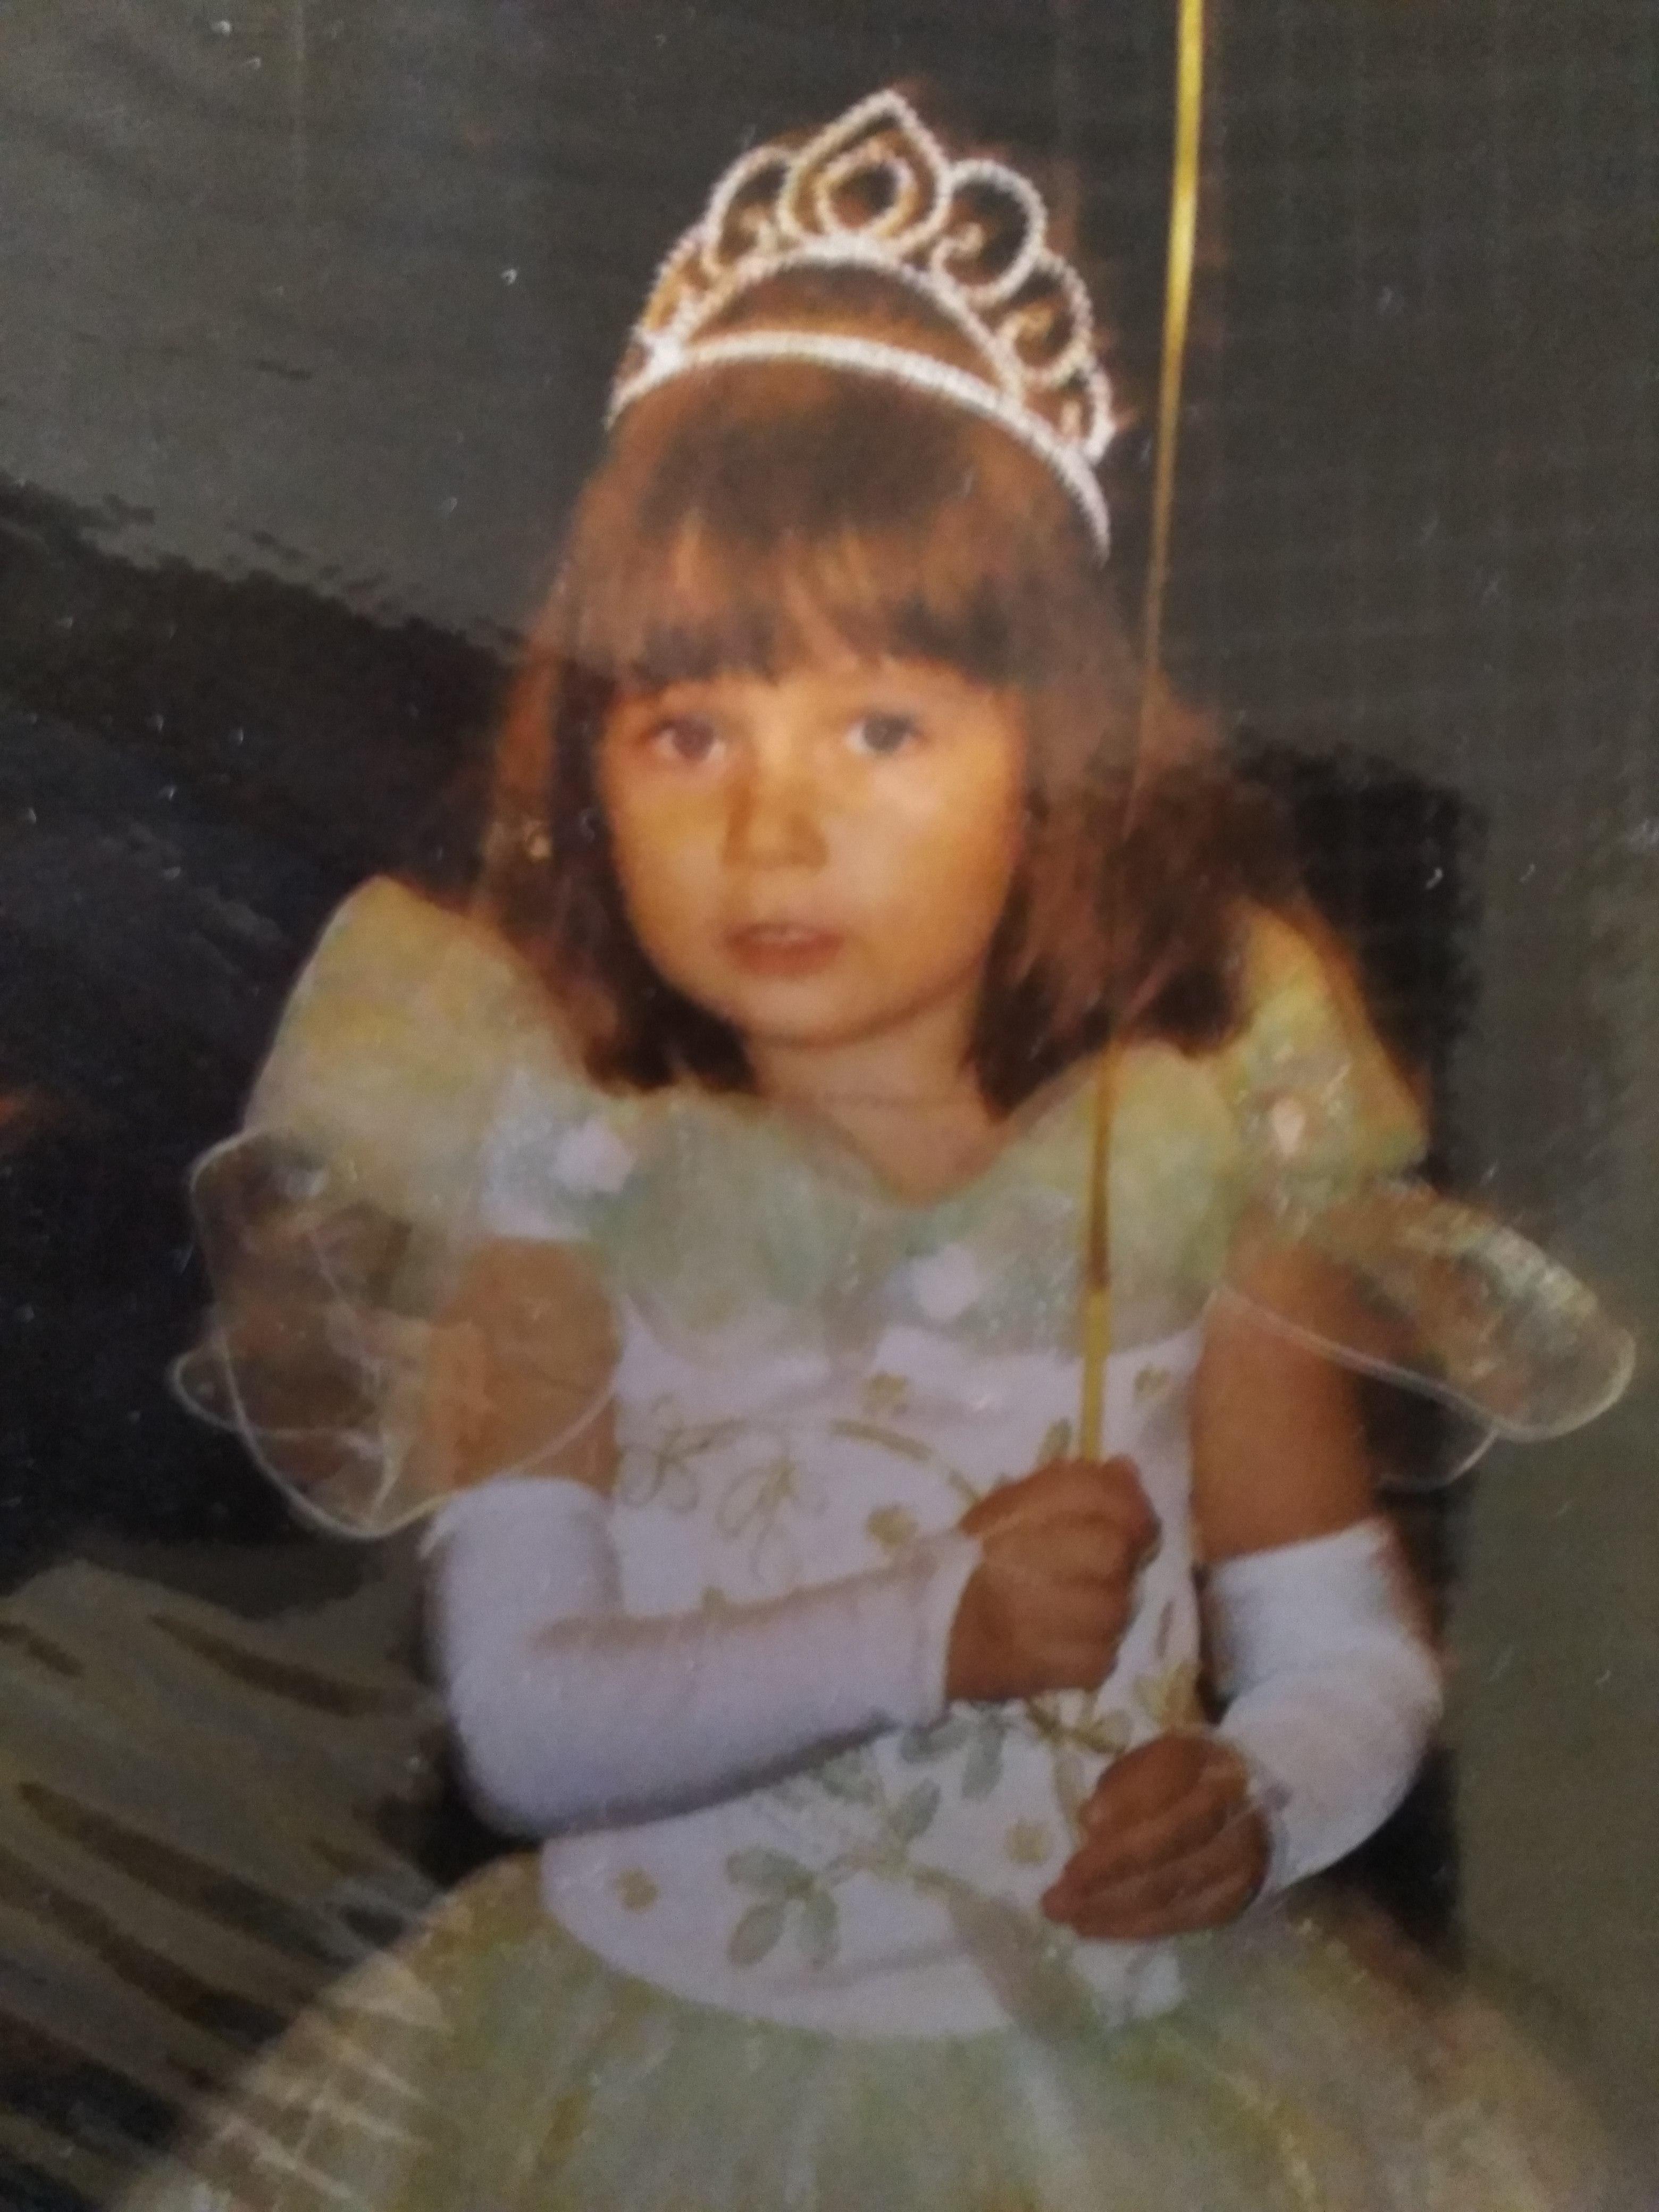 Принцесса. Принцесса собирается на бал